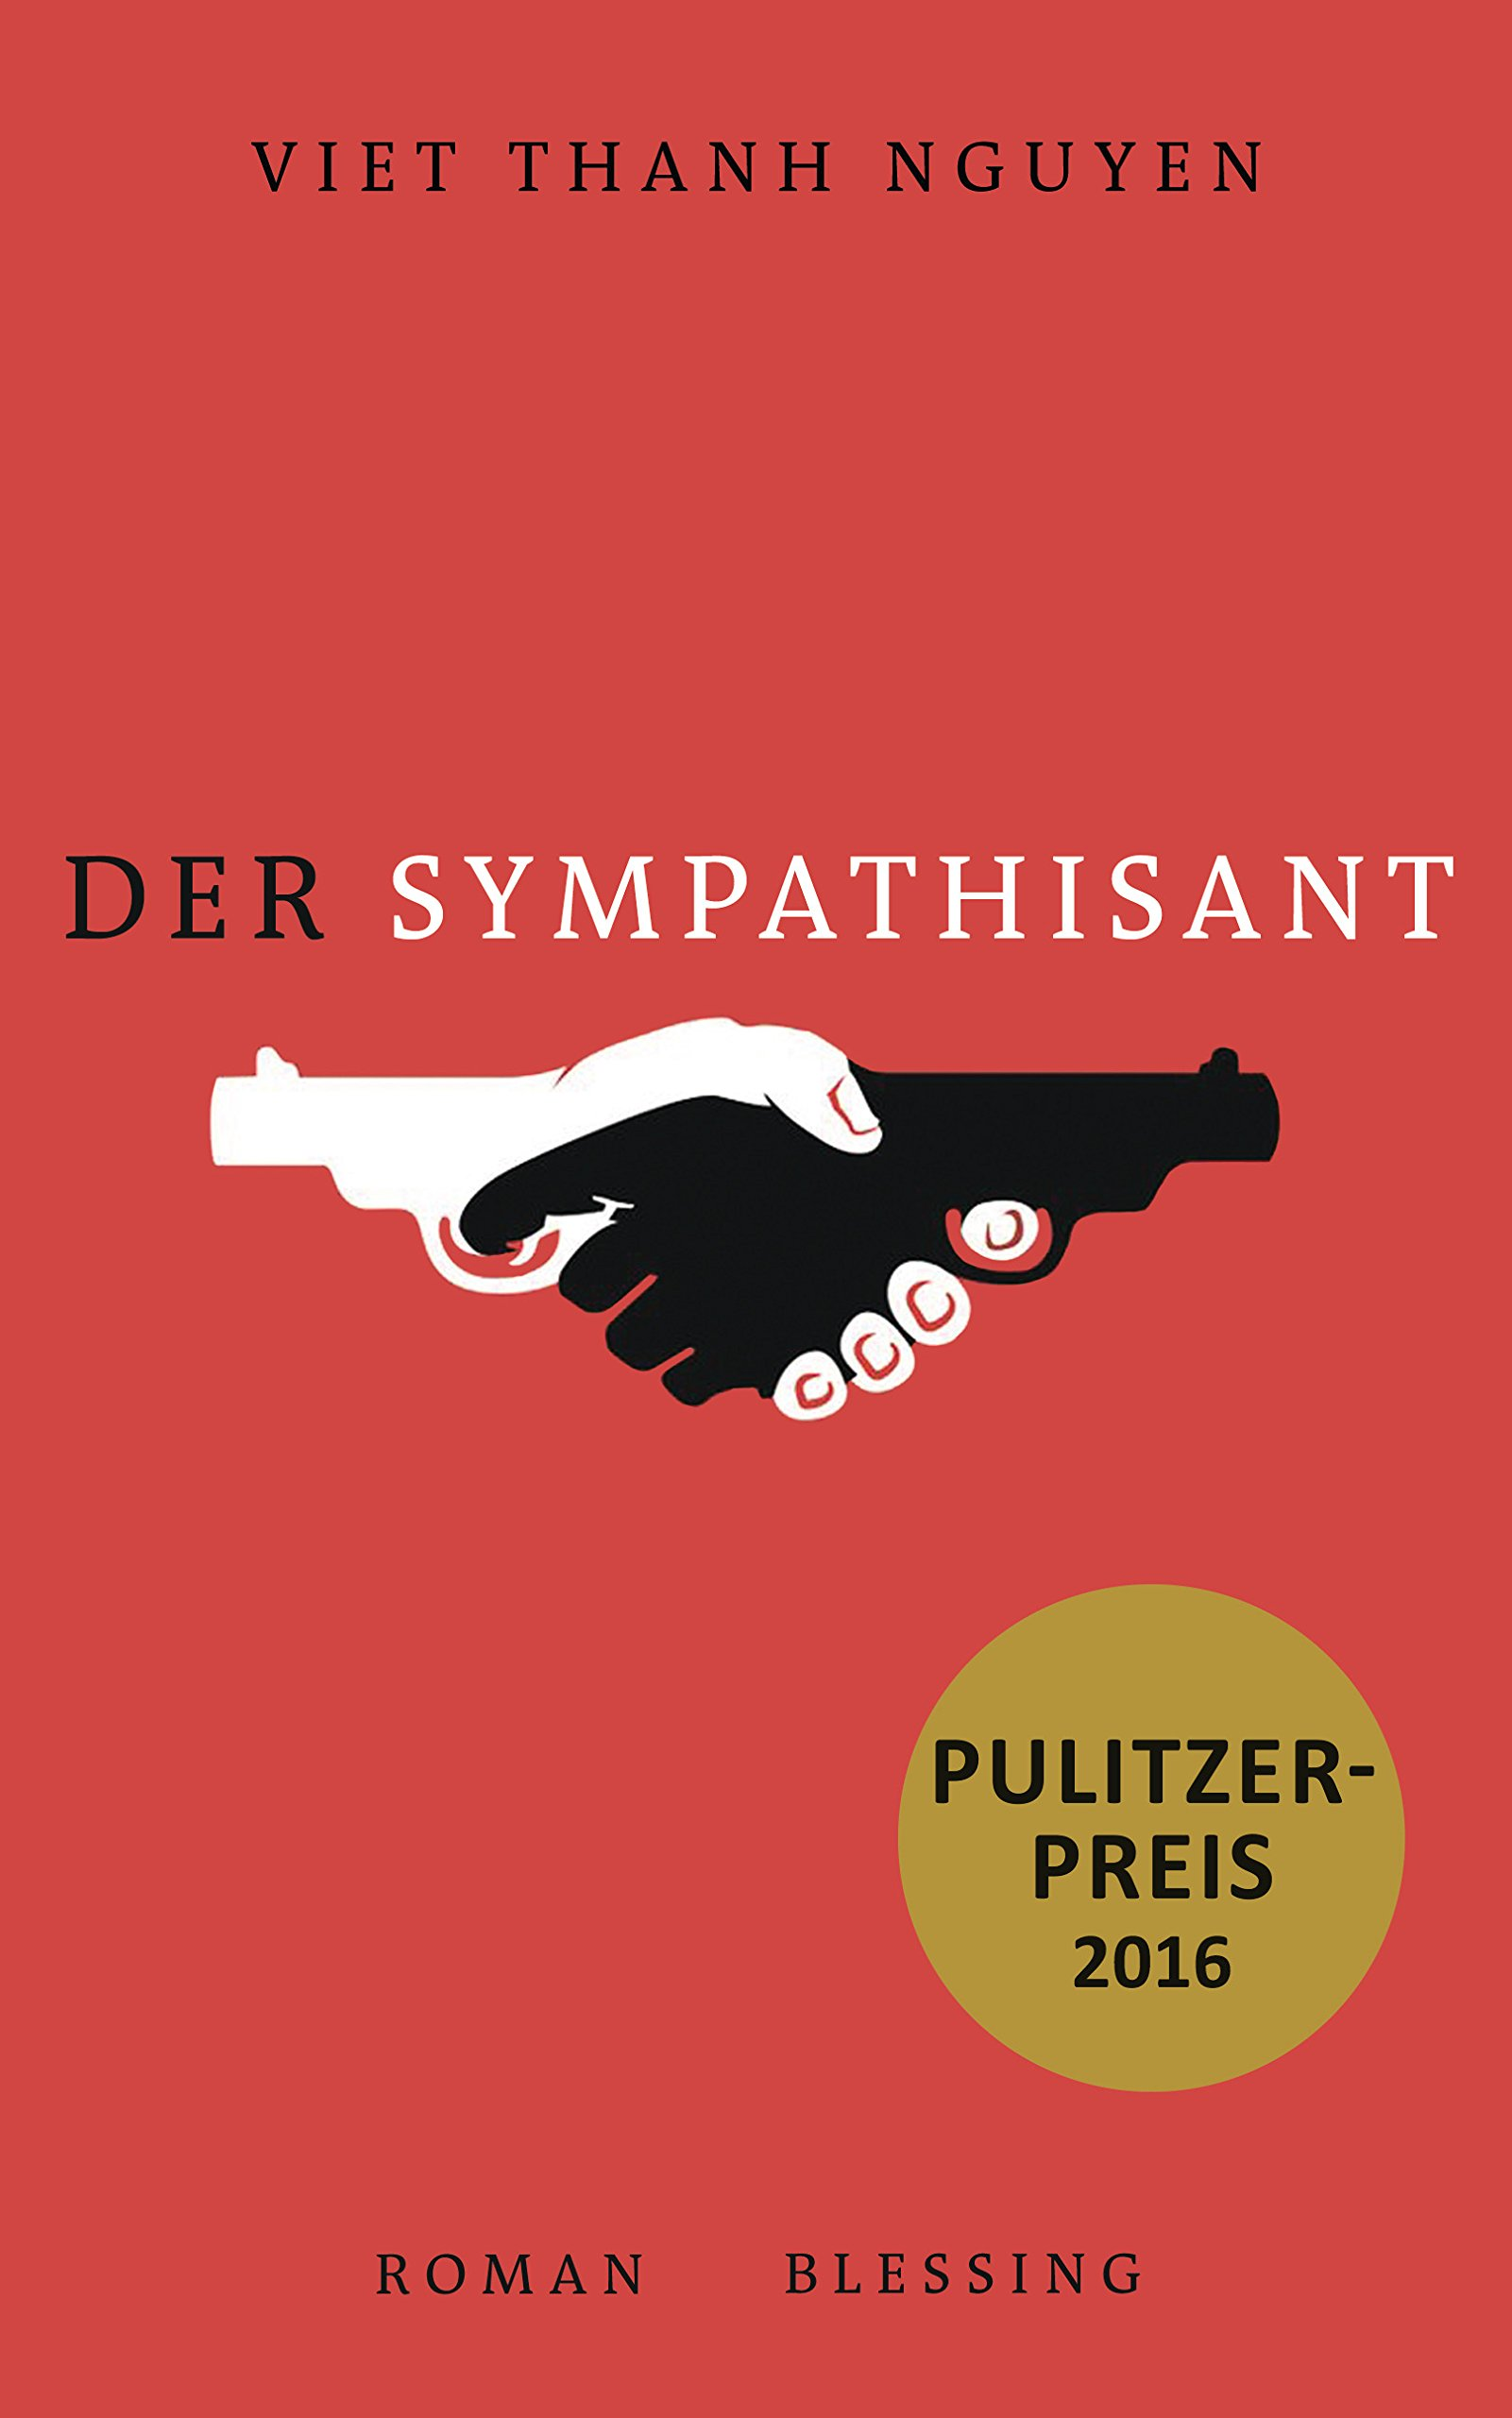 Der Sympathisant: Roman: Amazon.de: Viet Thanh Nguyen, Wolfgang ...